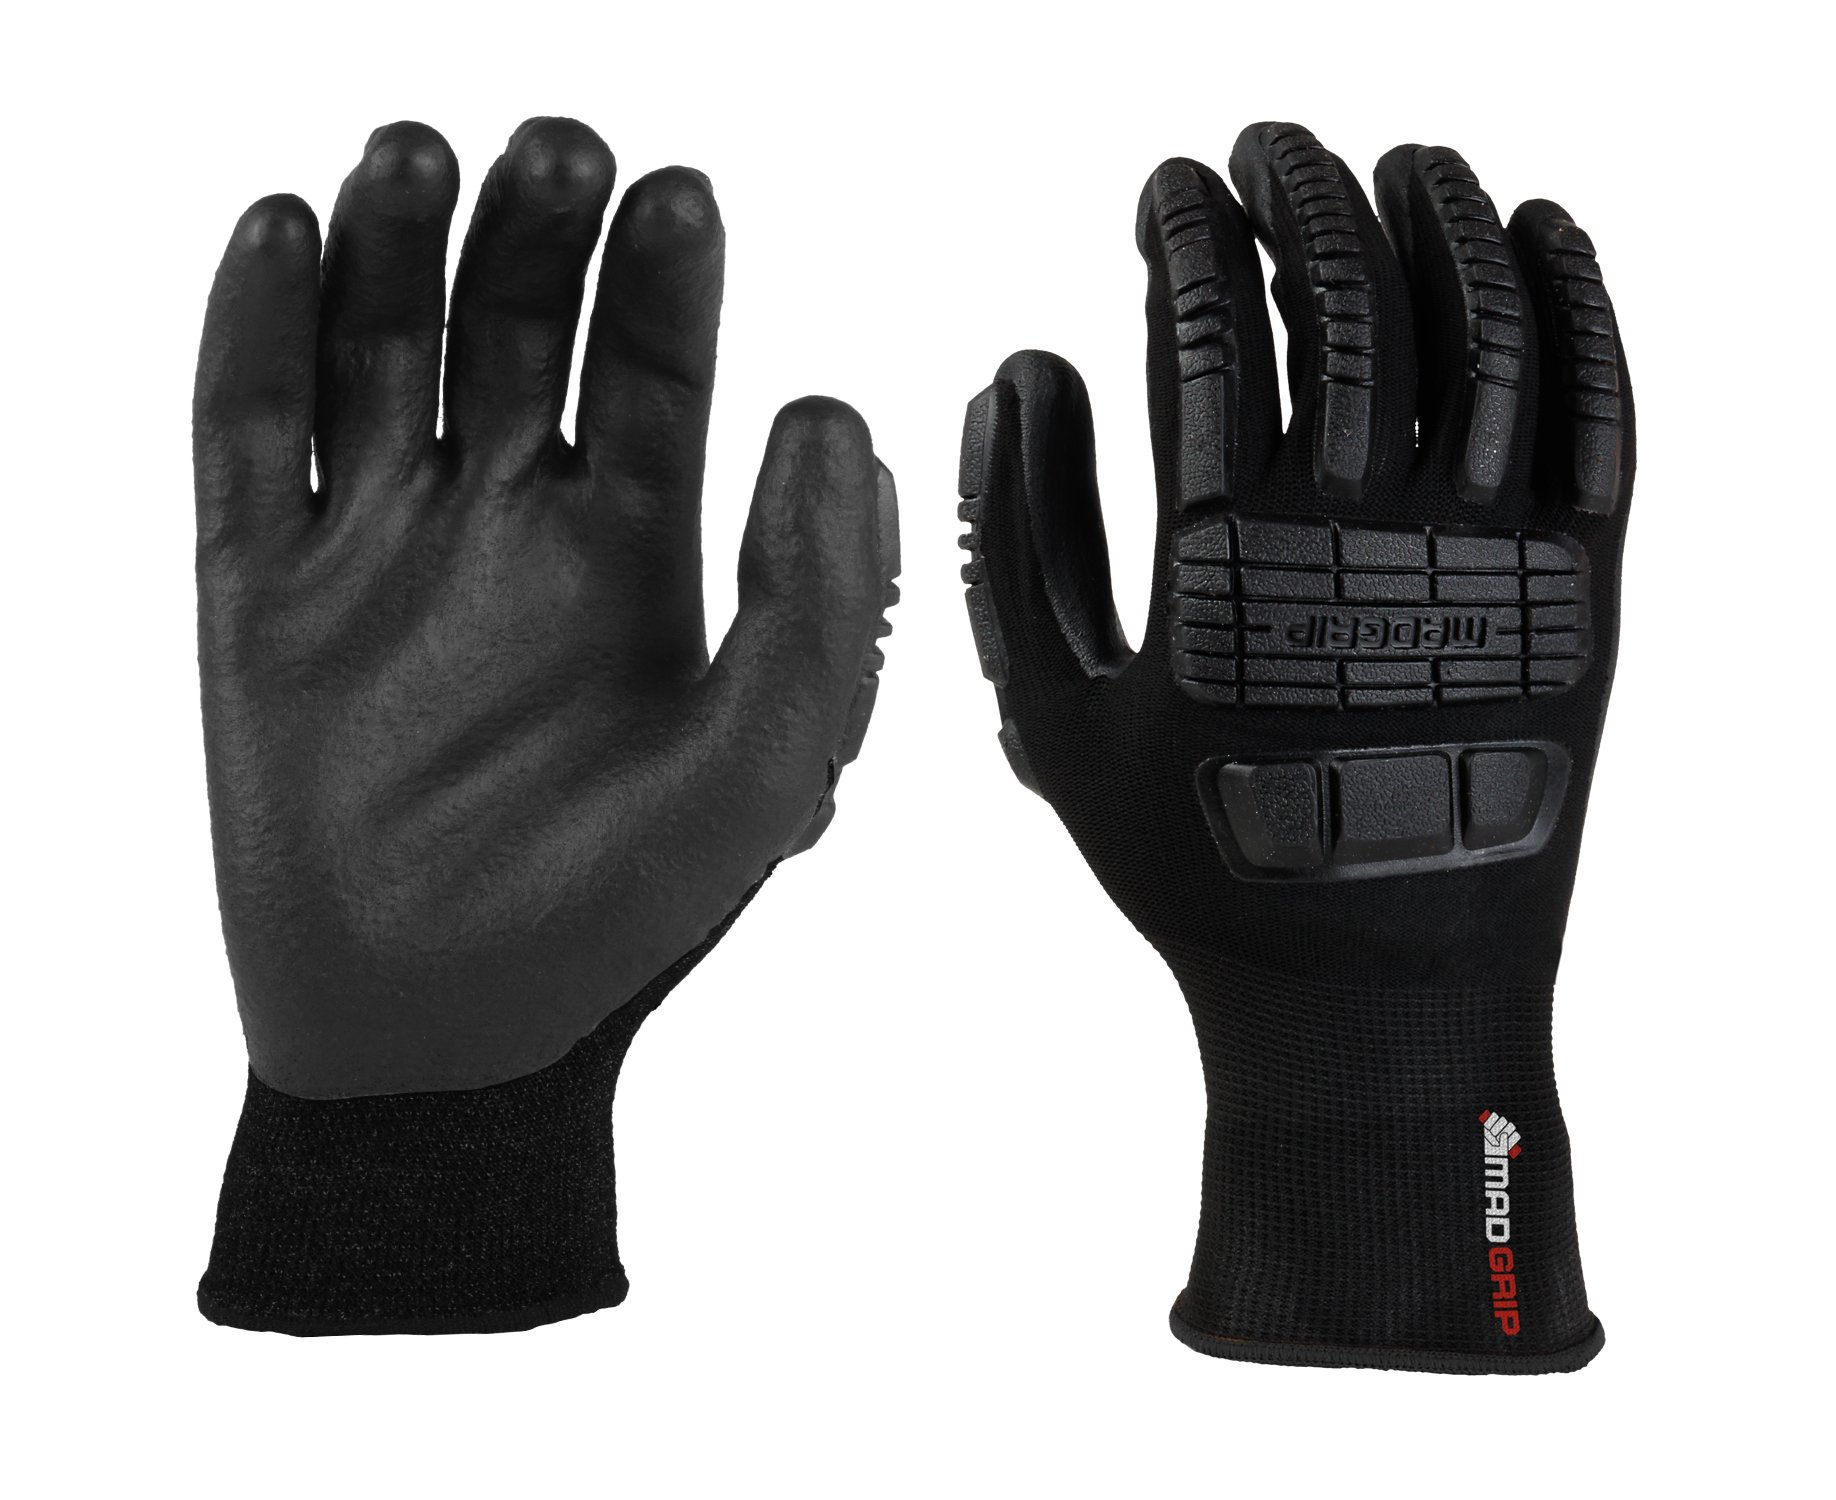 MadGrip Ergo Impact Foam Nitrile Palm Glove